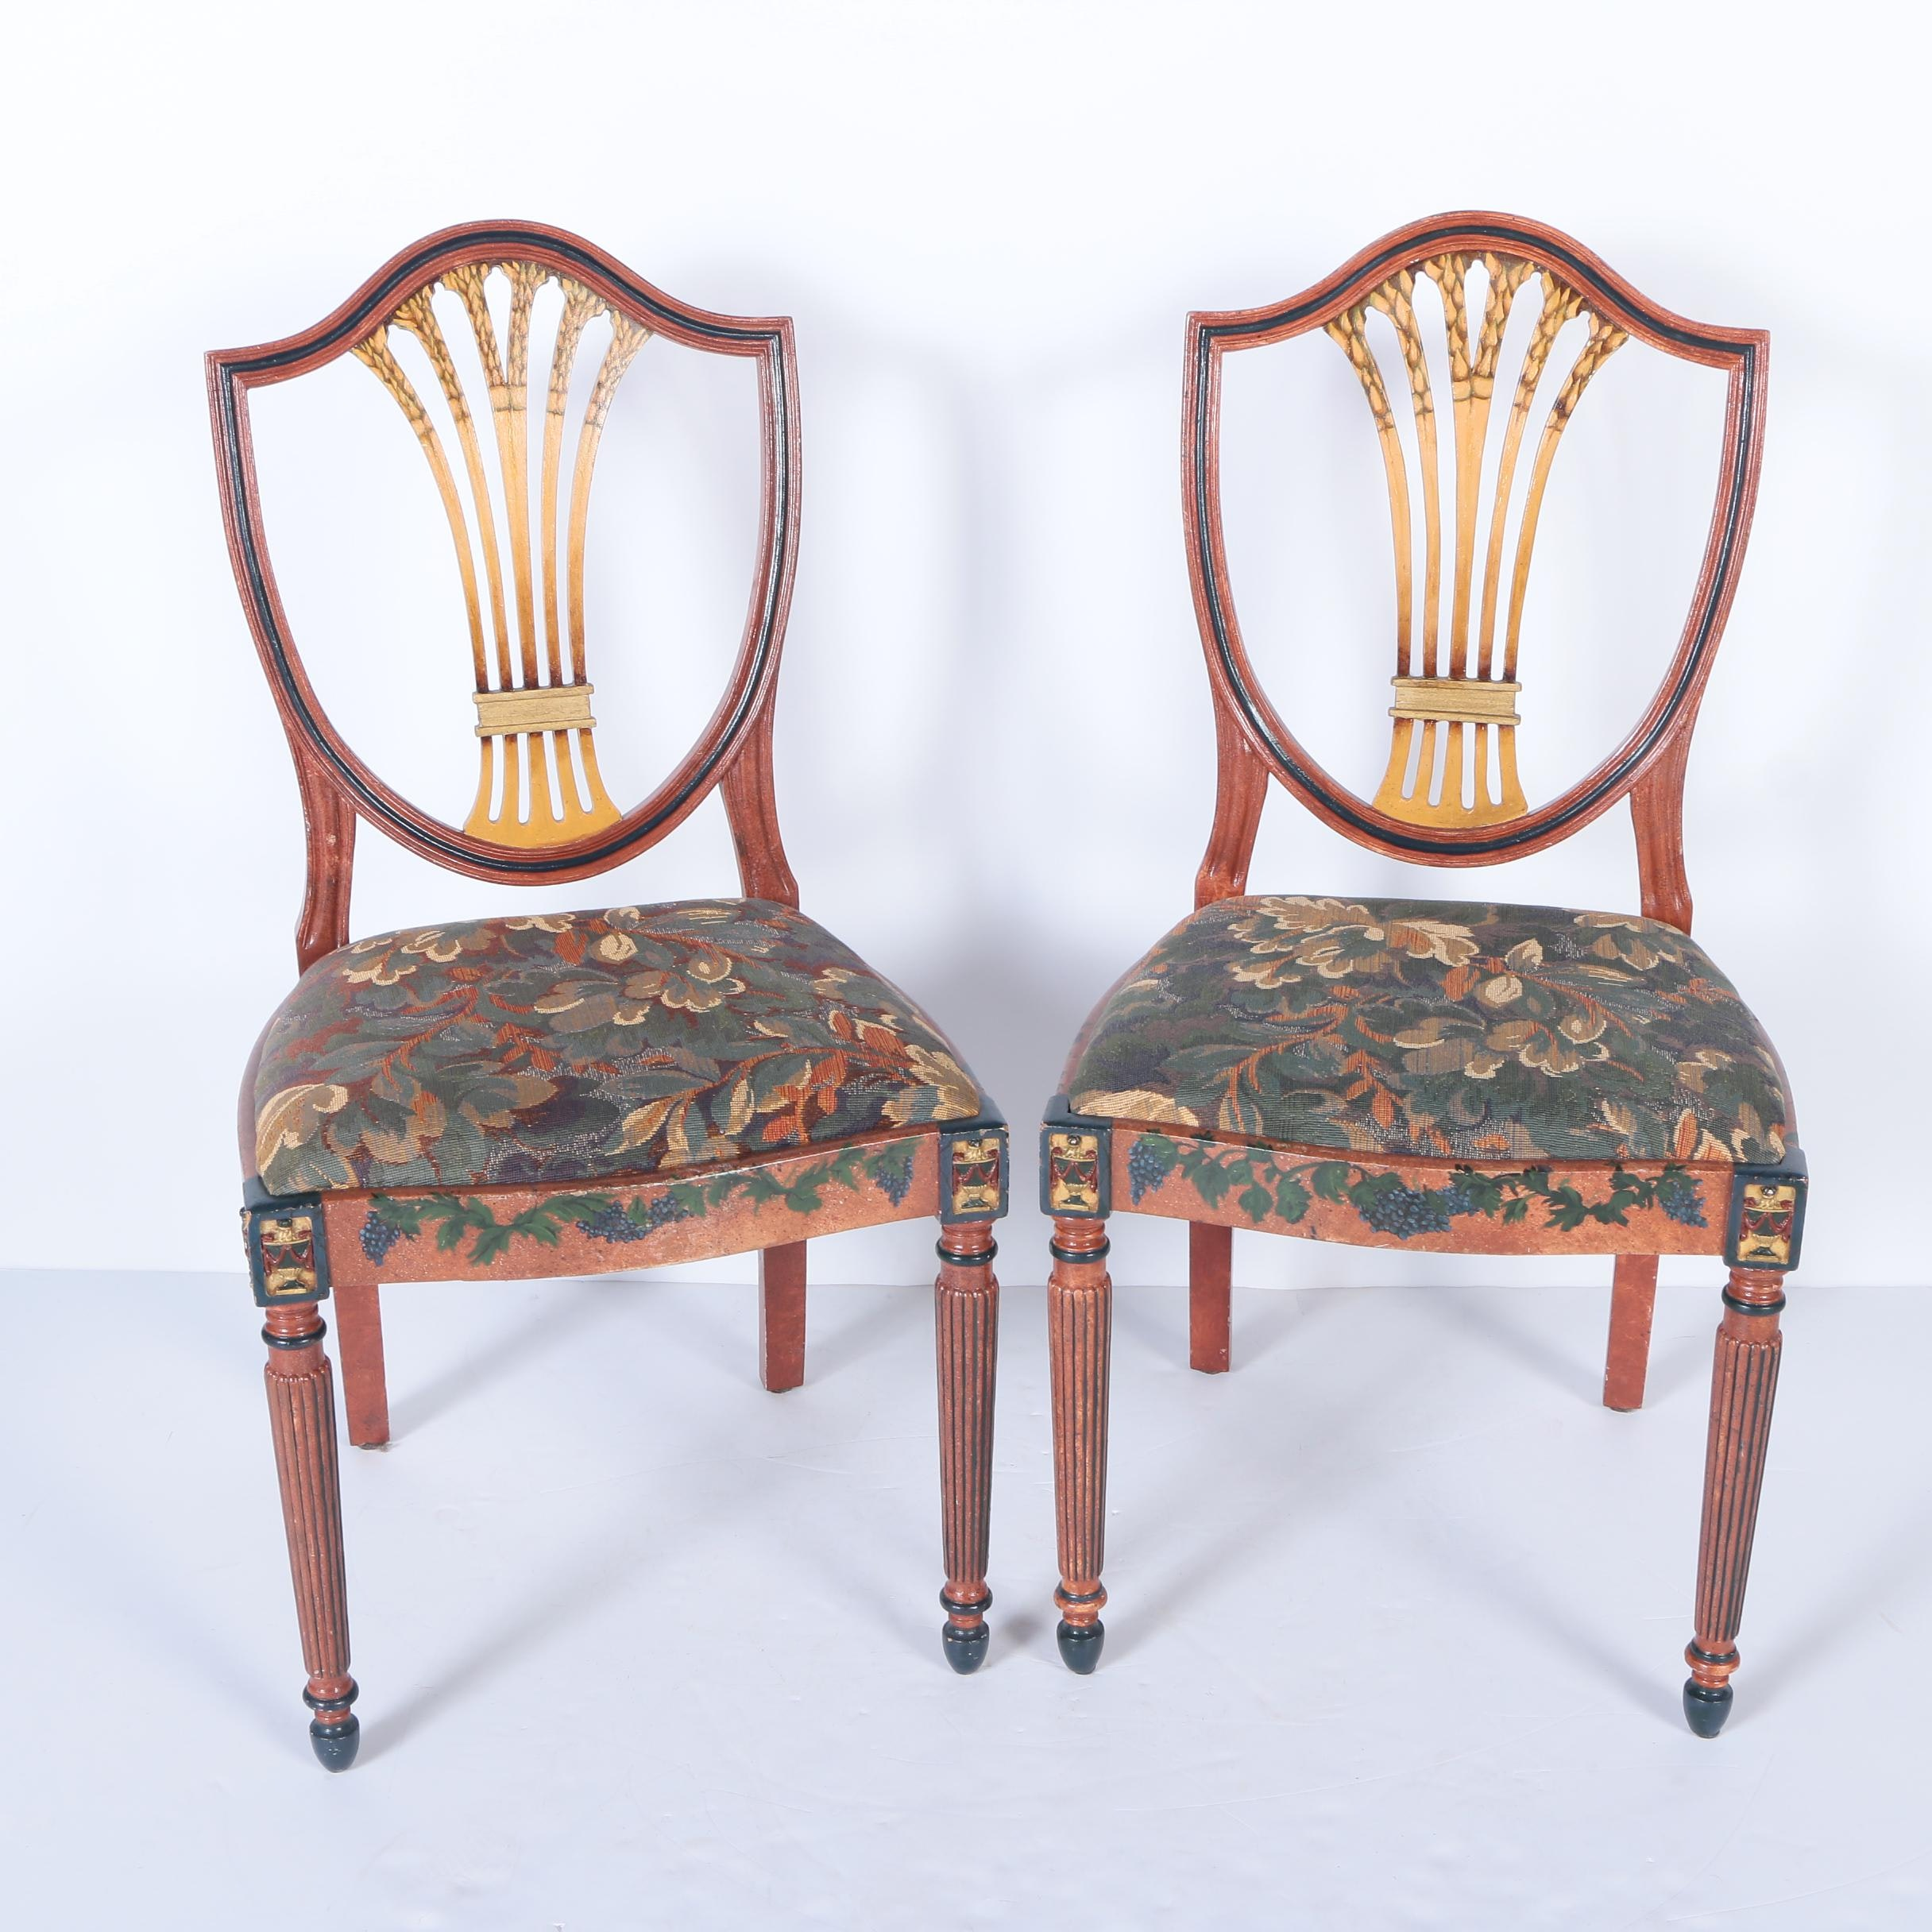 Sheraton Style Shield Back Chairs